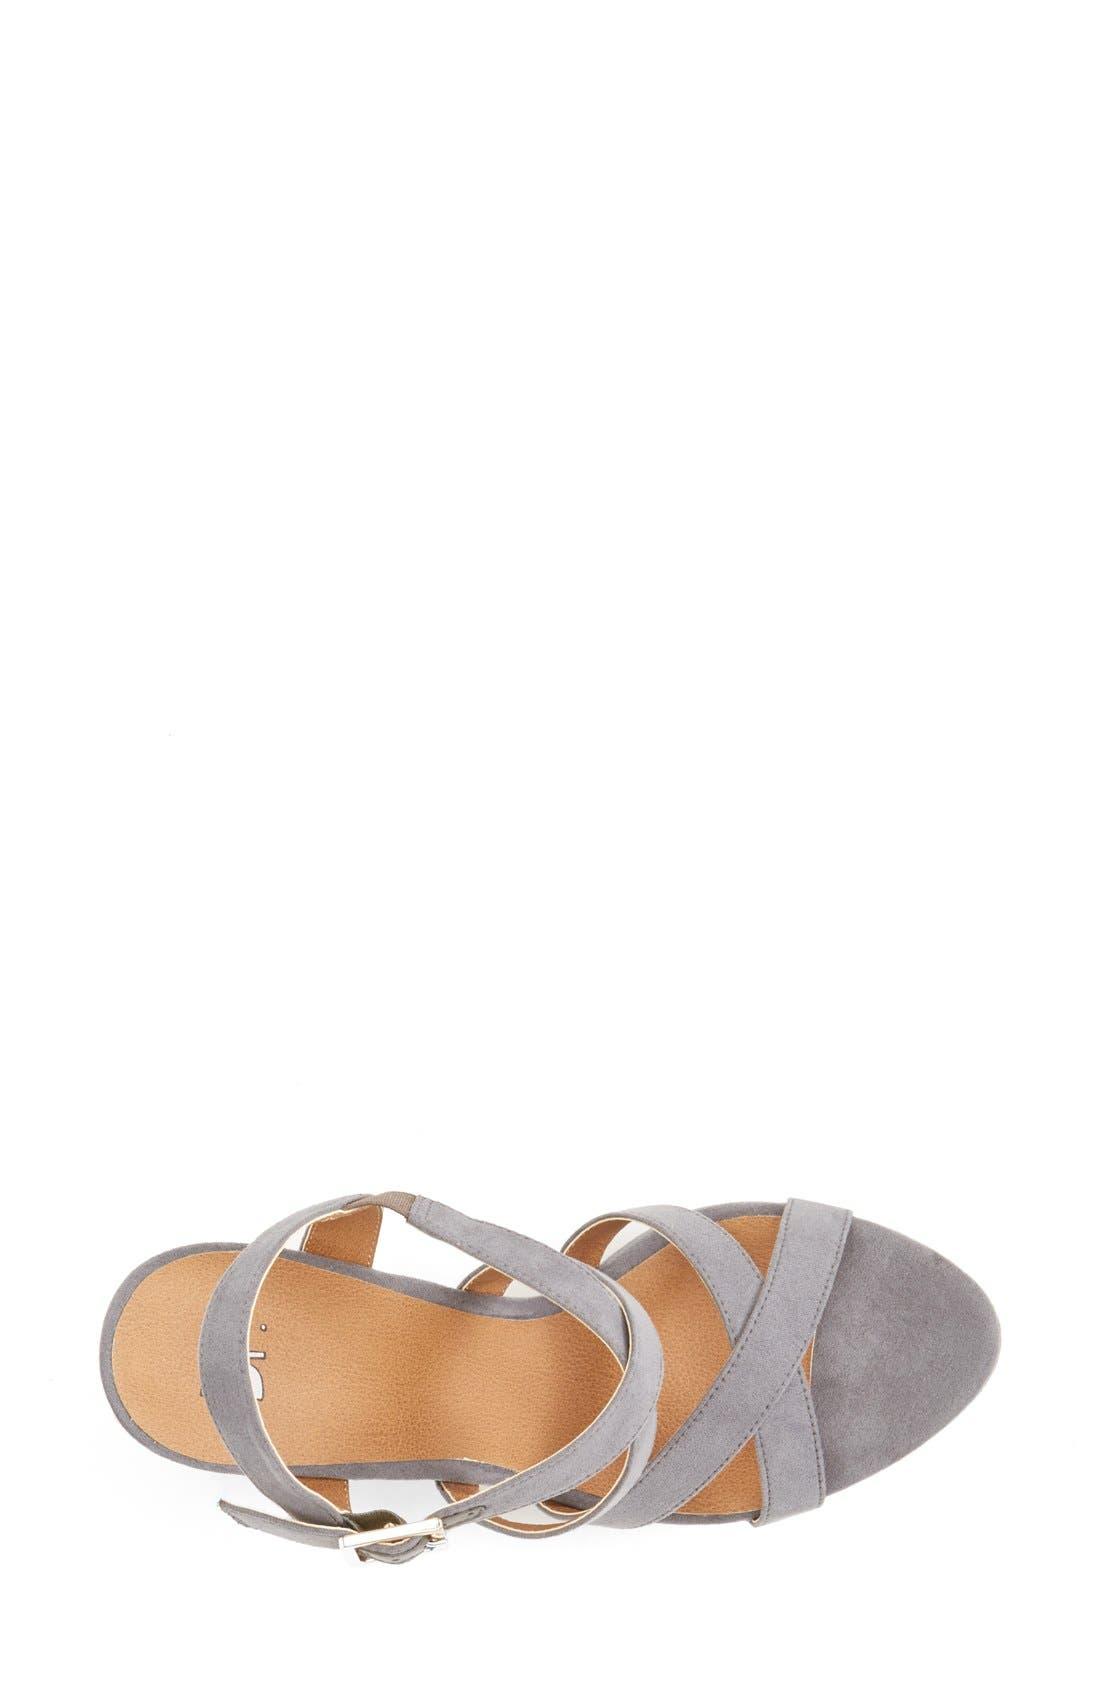 'Summers' Wedge Sandal,                             Alternate thumbnail 23, color,